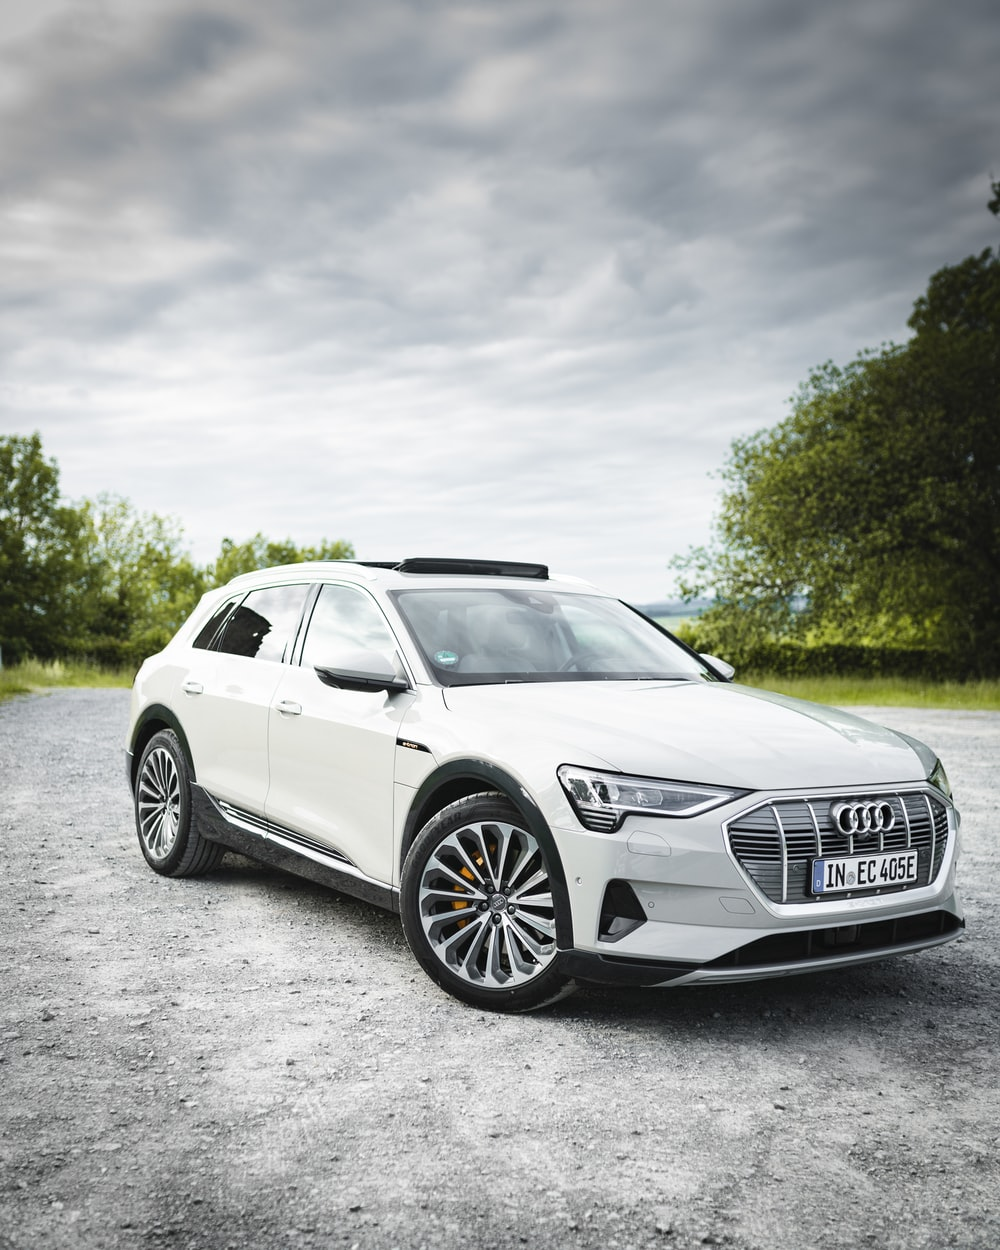 white Audi sedan on concrete road